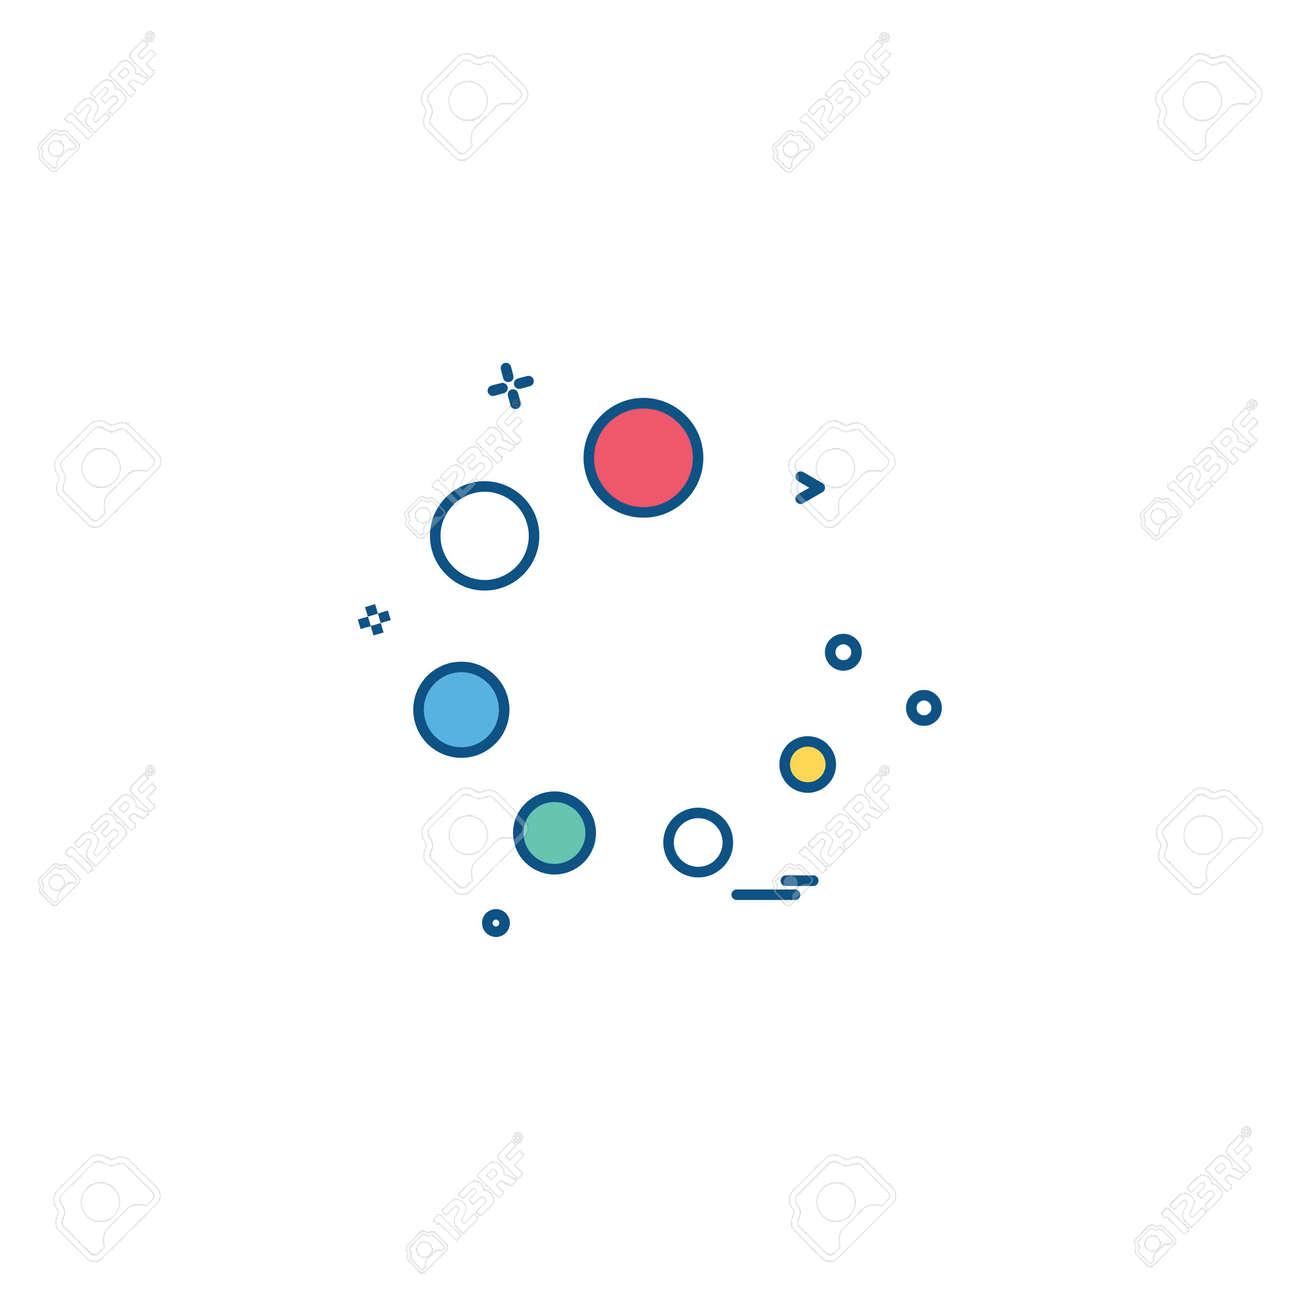 Progress icon design vector - 122160132